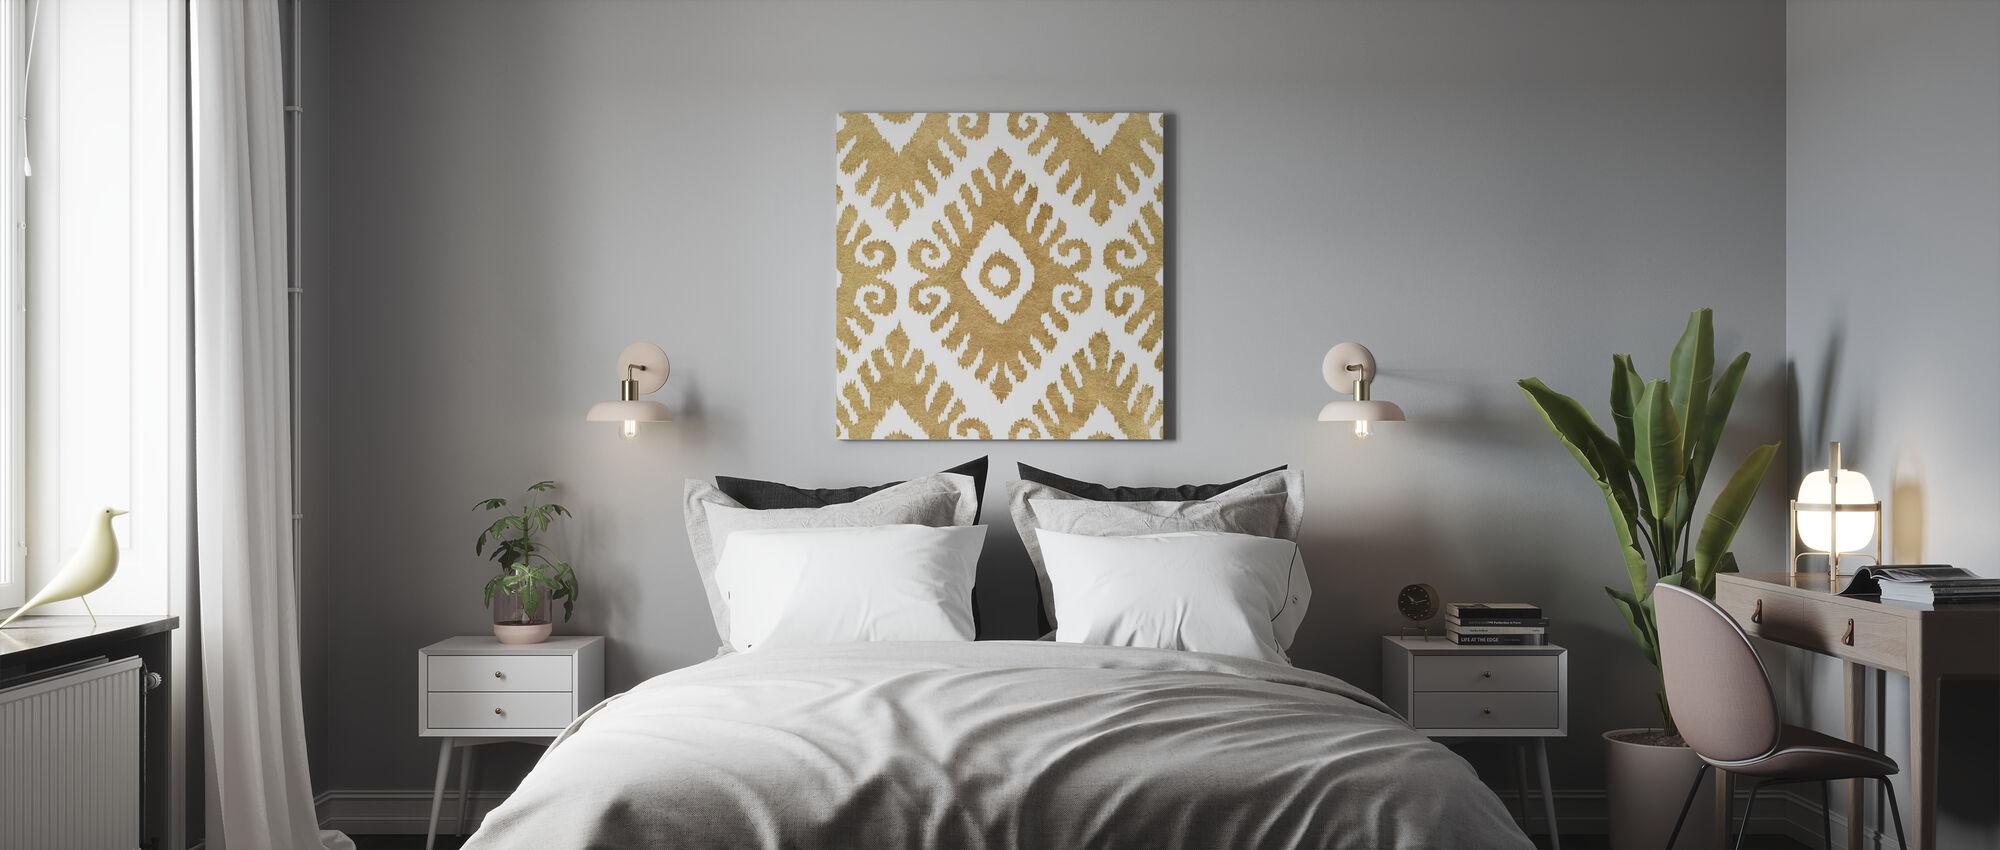 Simply Elegant IV - Canvas print - Bedroom